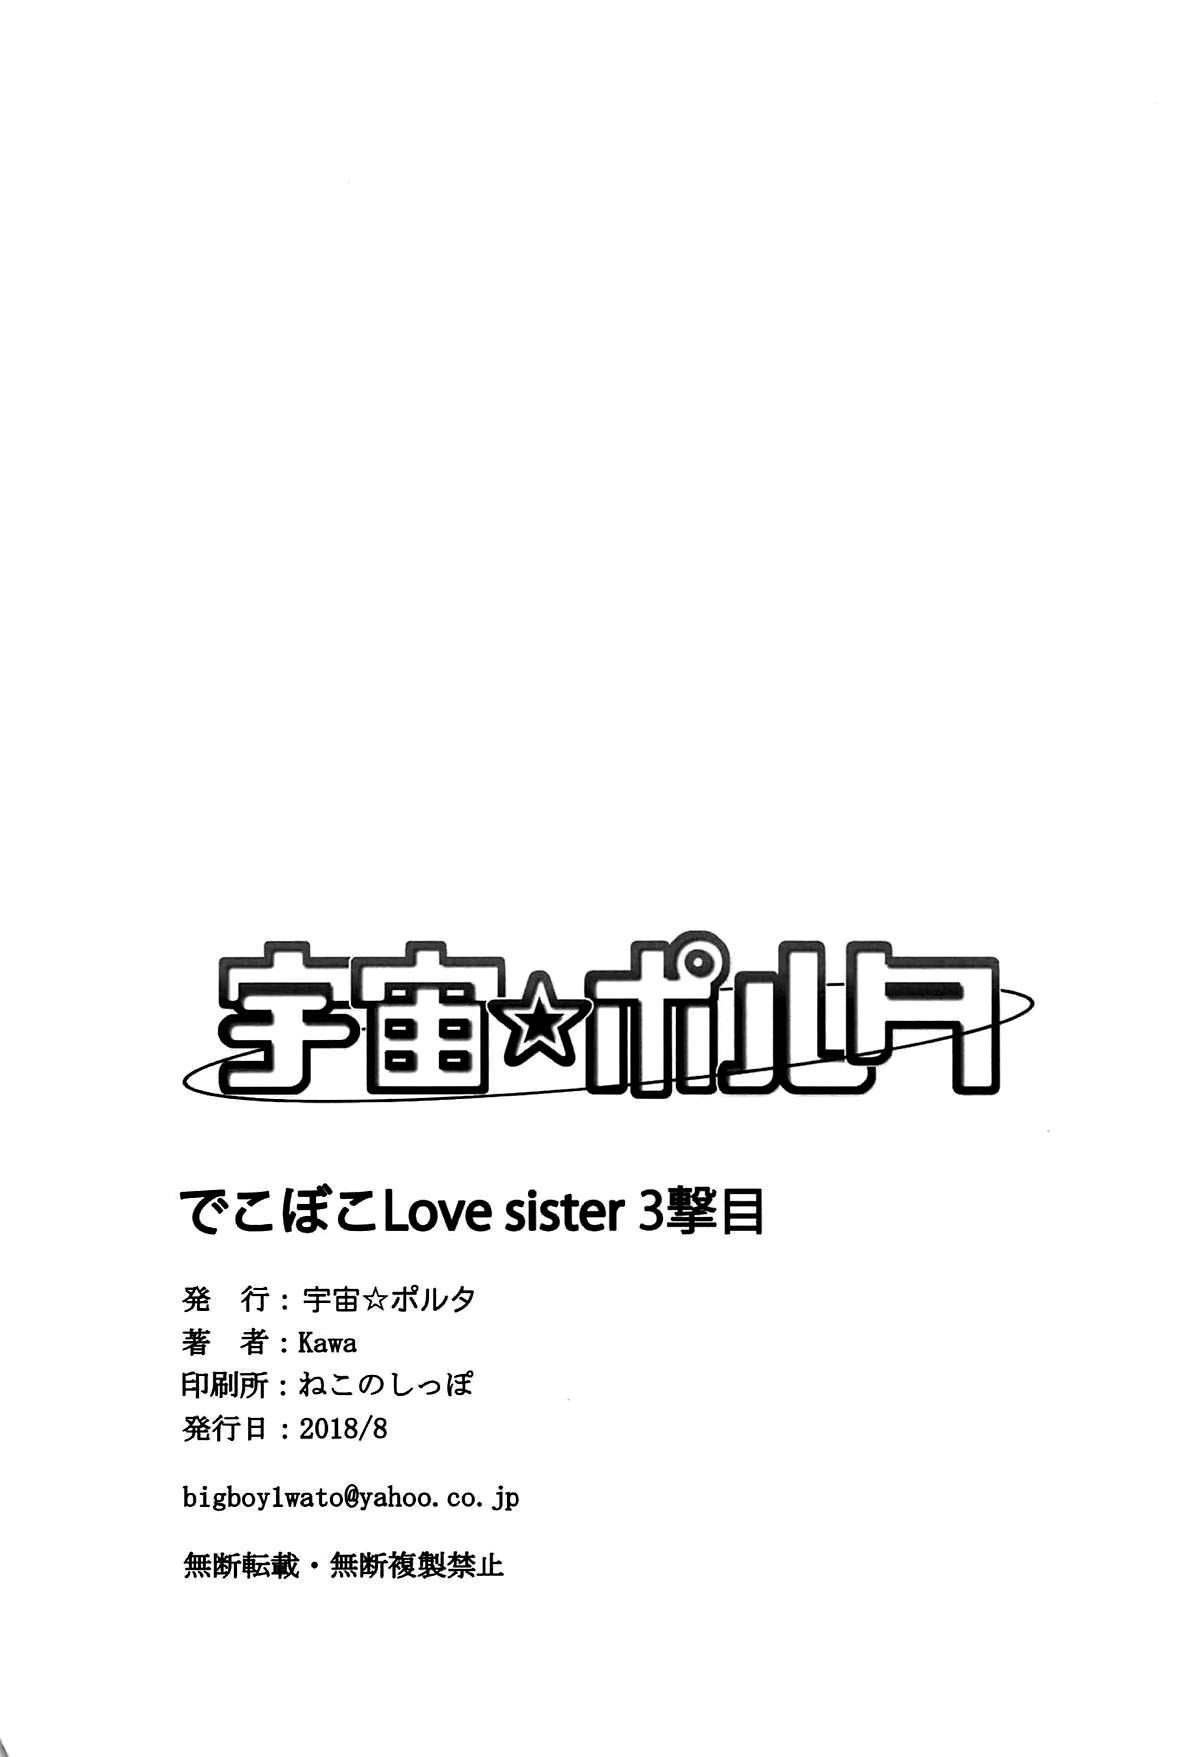 Dekoboko Love sister 3-gekime 40